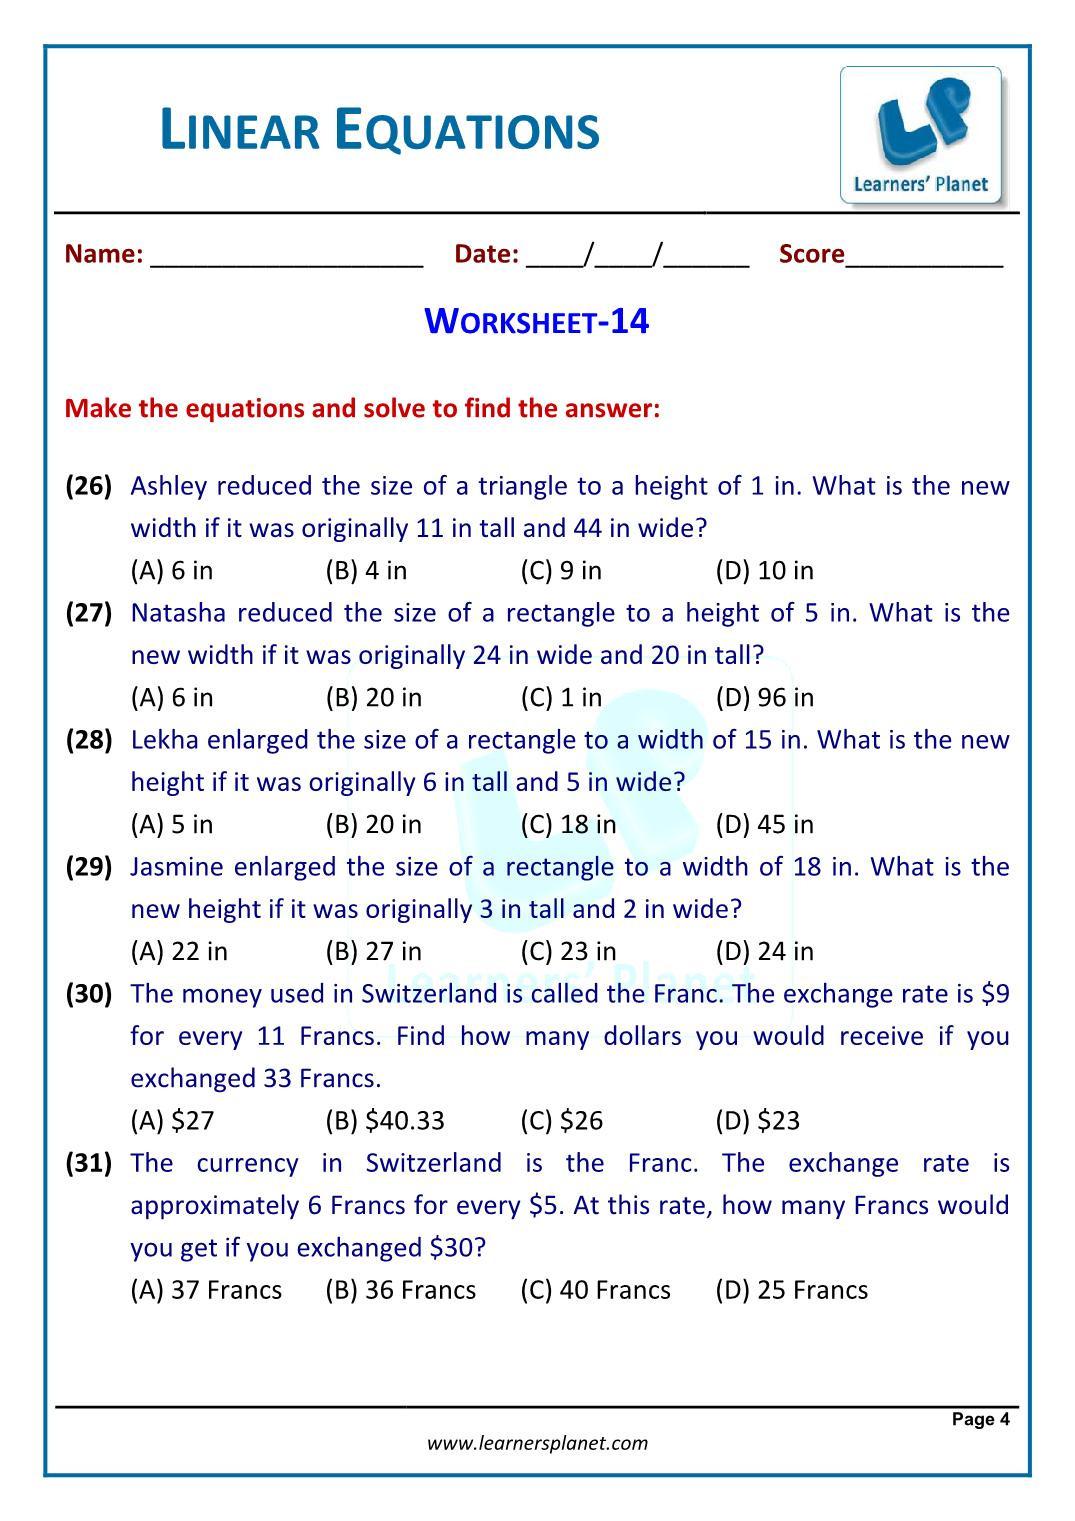 Linear Equation Word Problems Worksheet Grade 7 Linear Equations In One Variable Word Problems